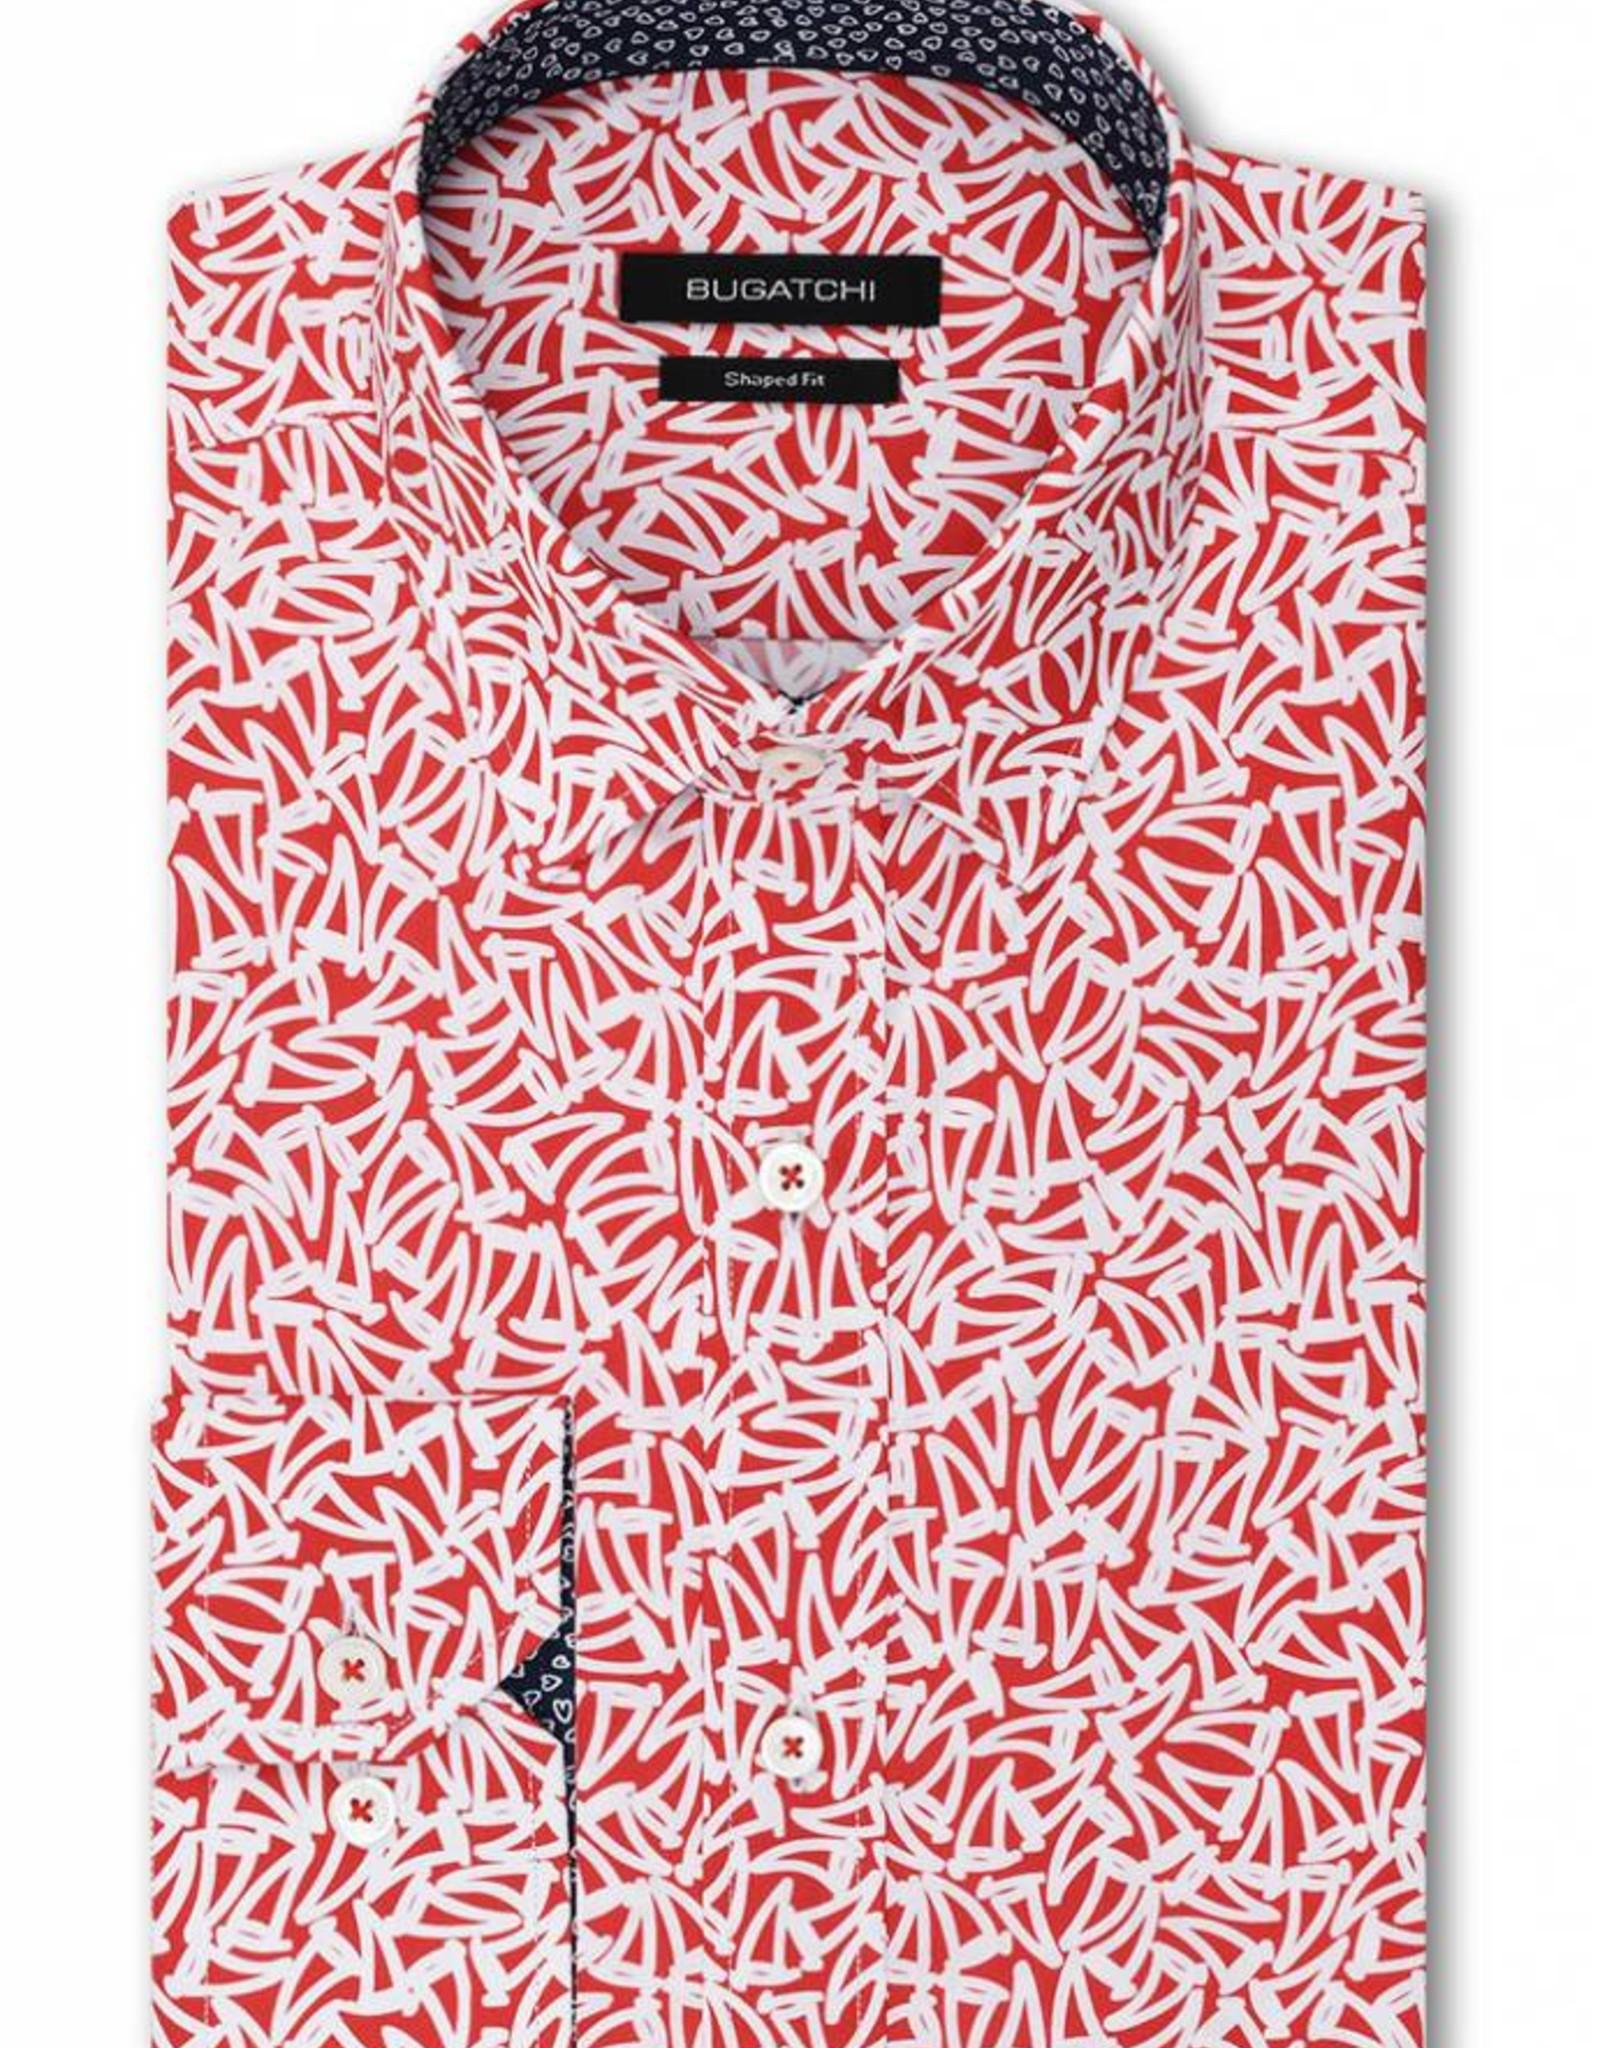 Bugatchi Bugatchi Pimento L/S Classic Fit Shirt